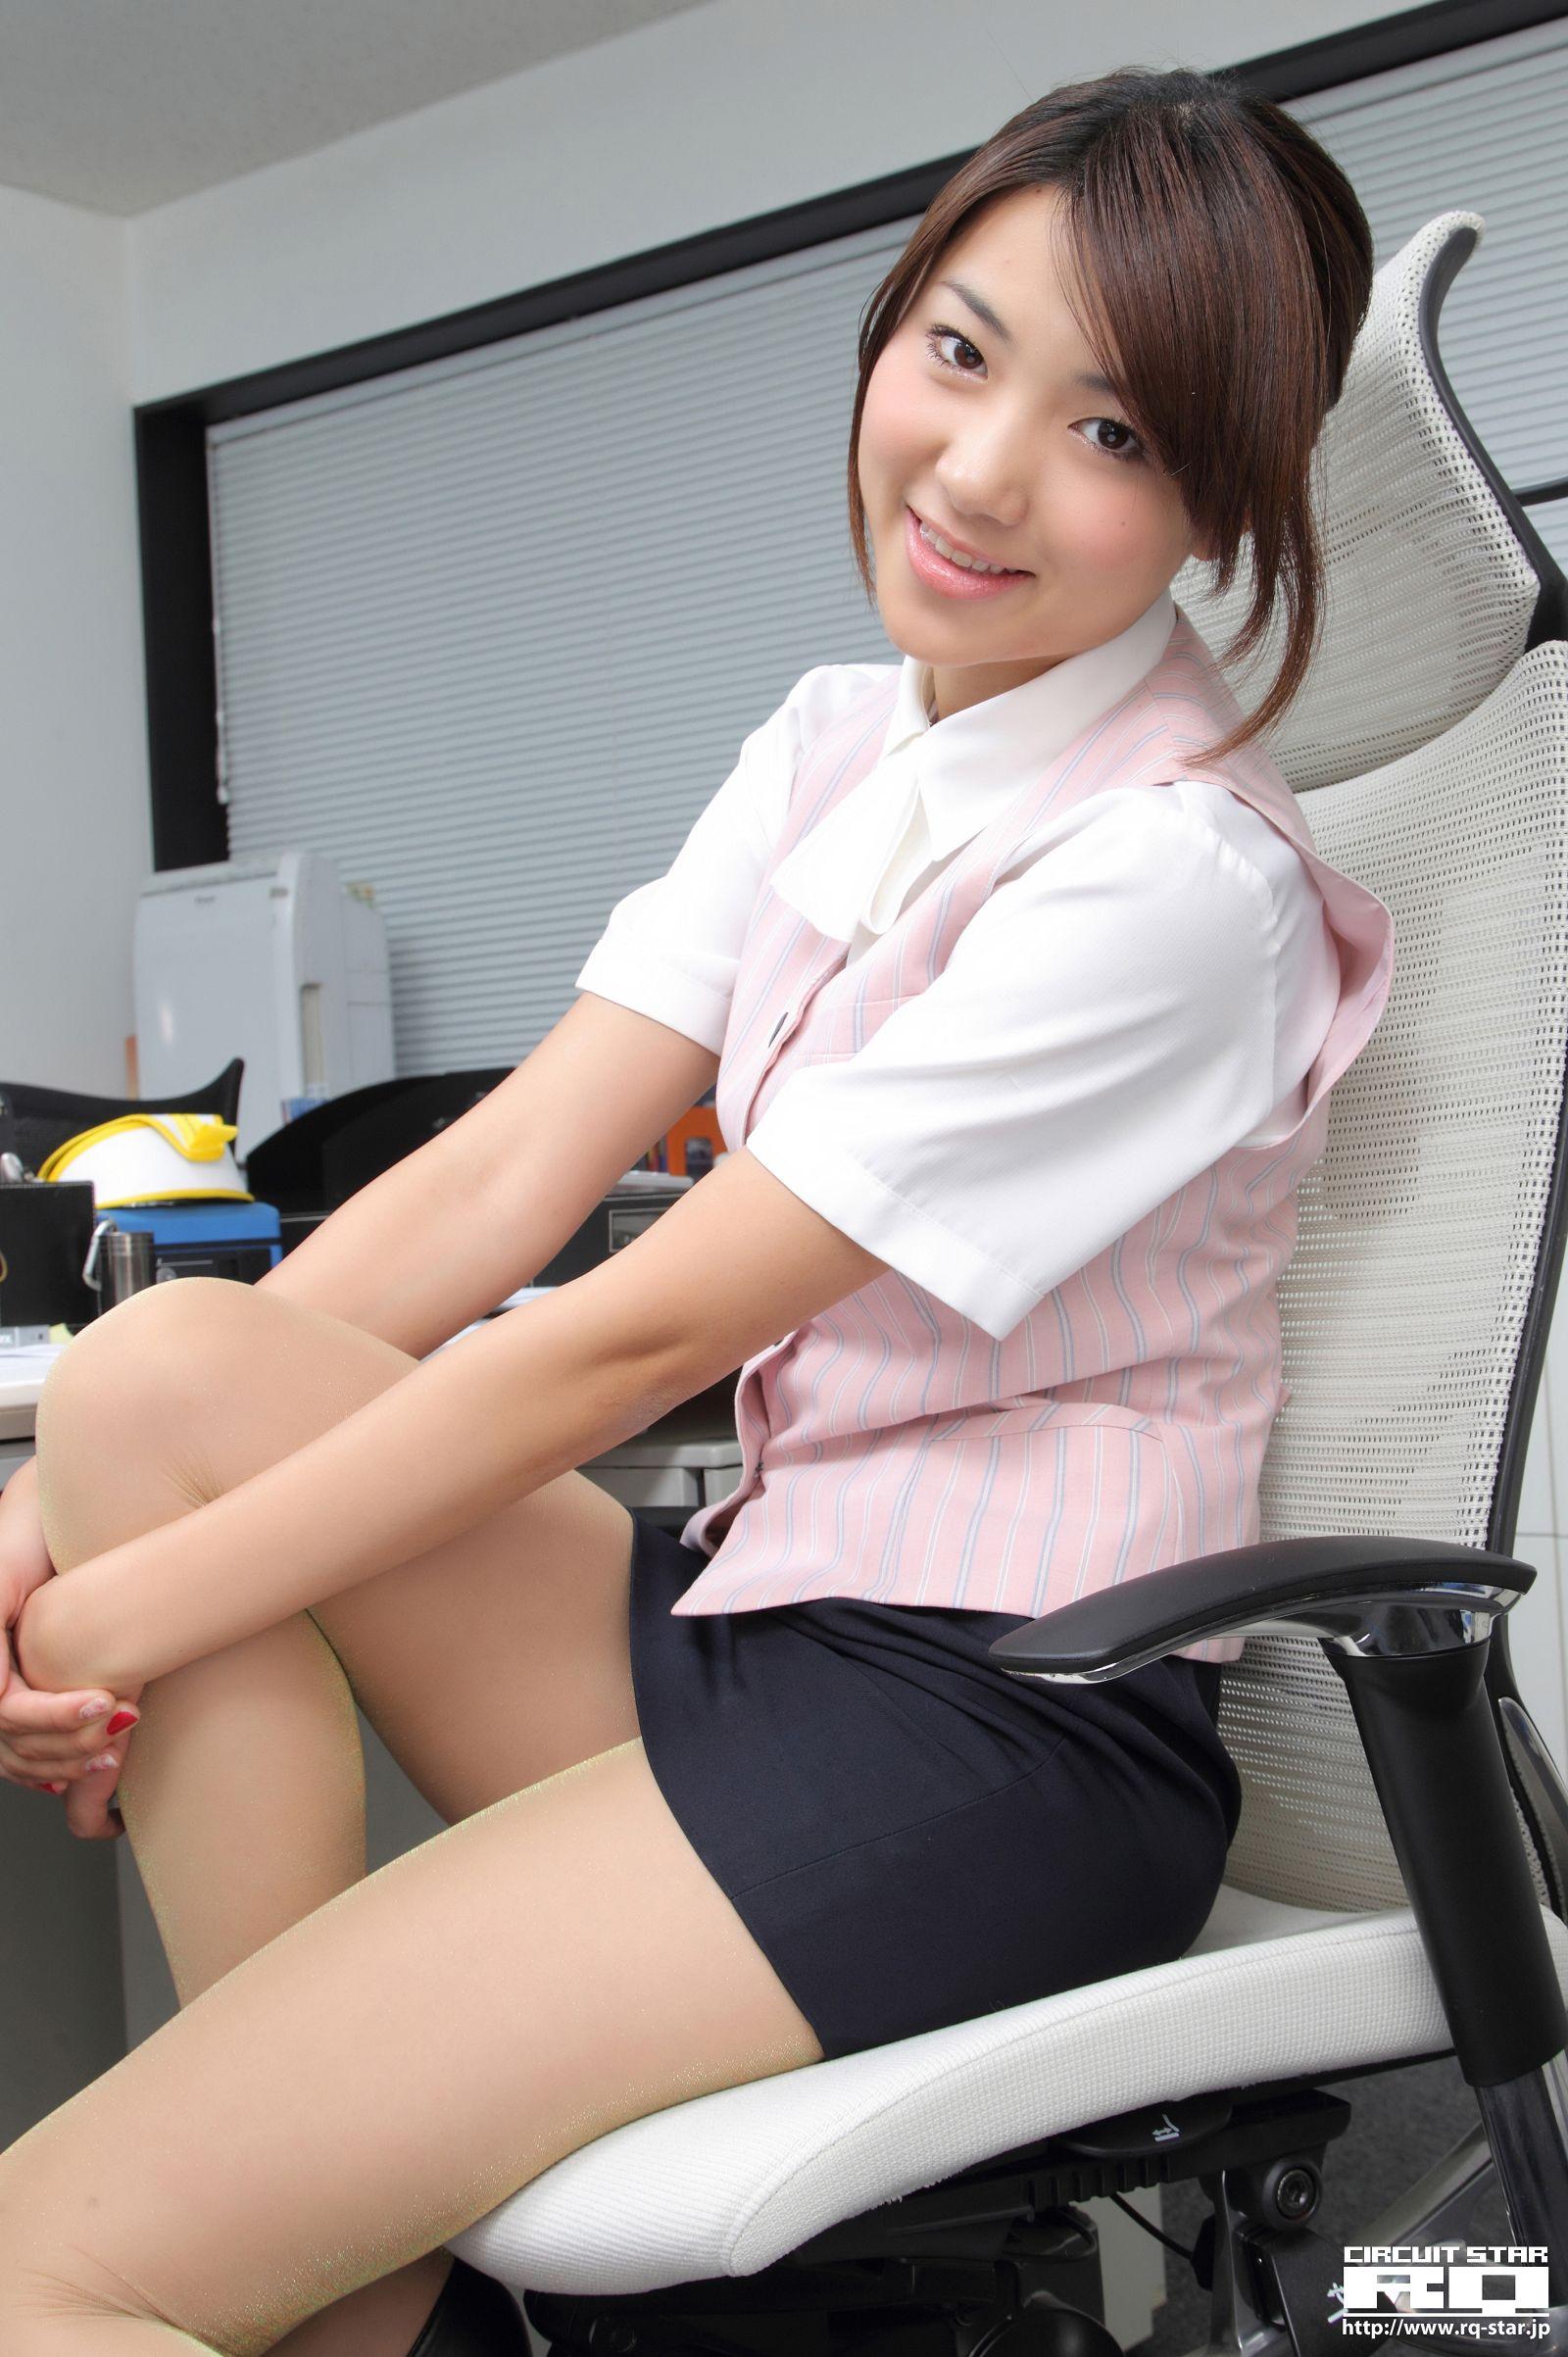 [RQ STAR美女] NO.00583 Naoho Ichihashi 市橋直歩 Office Lady[130P] RQ STAR 第3张